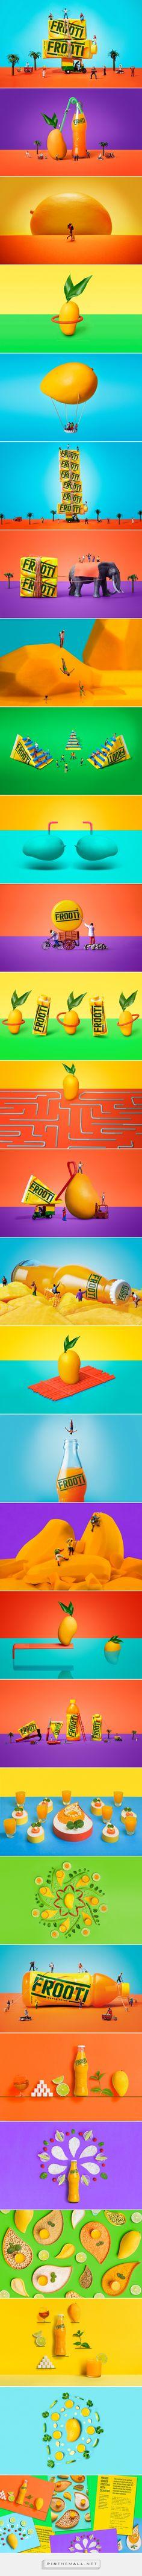 Frooti - Work - Sagmeister & Walsh - created on Sagmeister And Walsh, Stefan Sagmeister, Cover Design, Design Art, Graphic Design, Packaging Design, Branding Design, Text Pictures, Art Direction